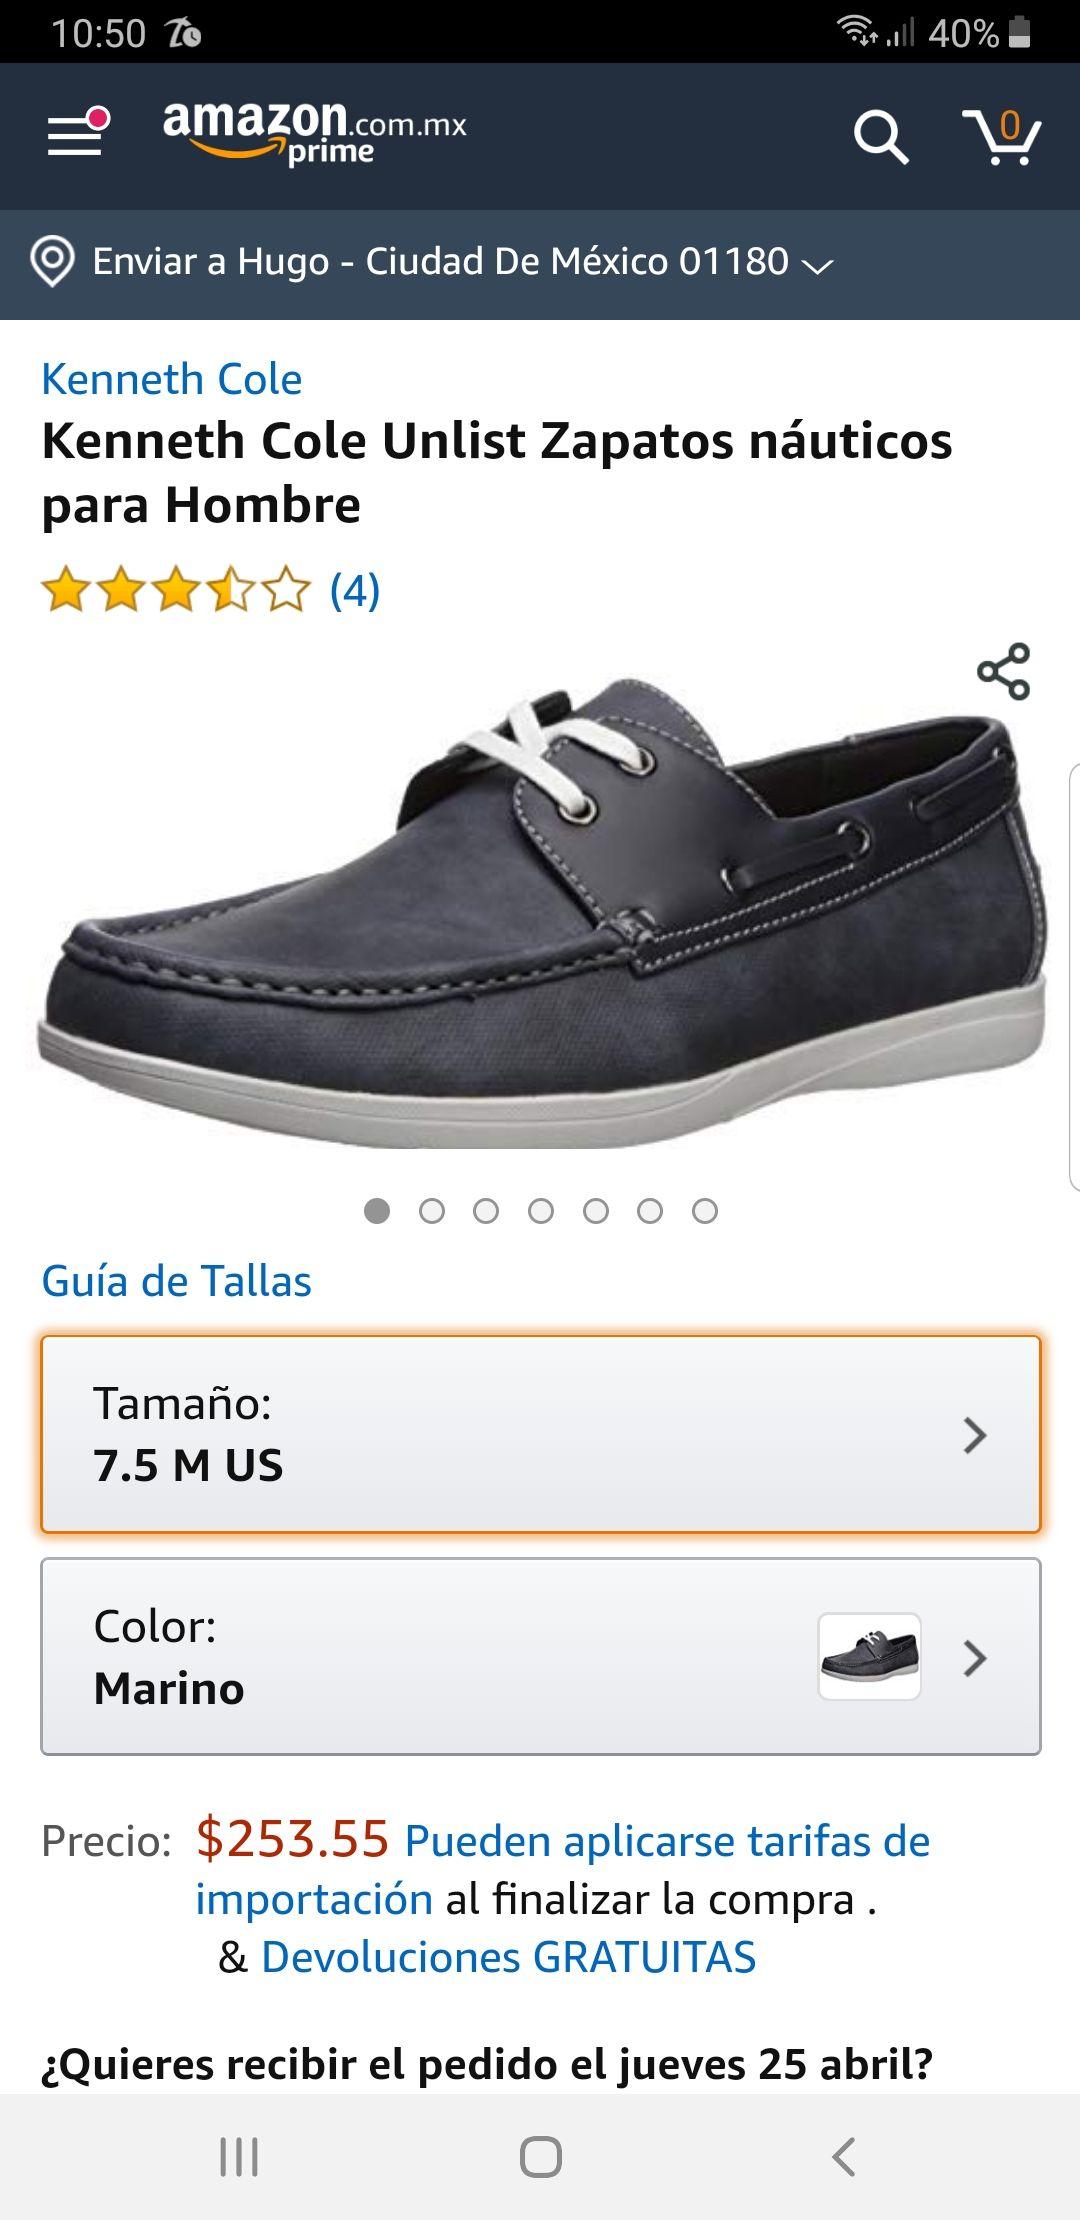 Amazon: Zapatos Nauticos, buen costo